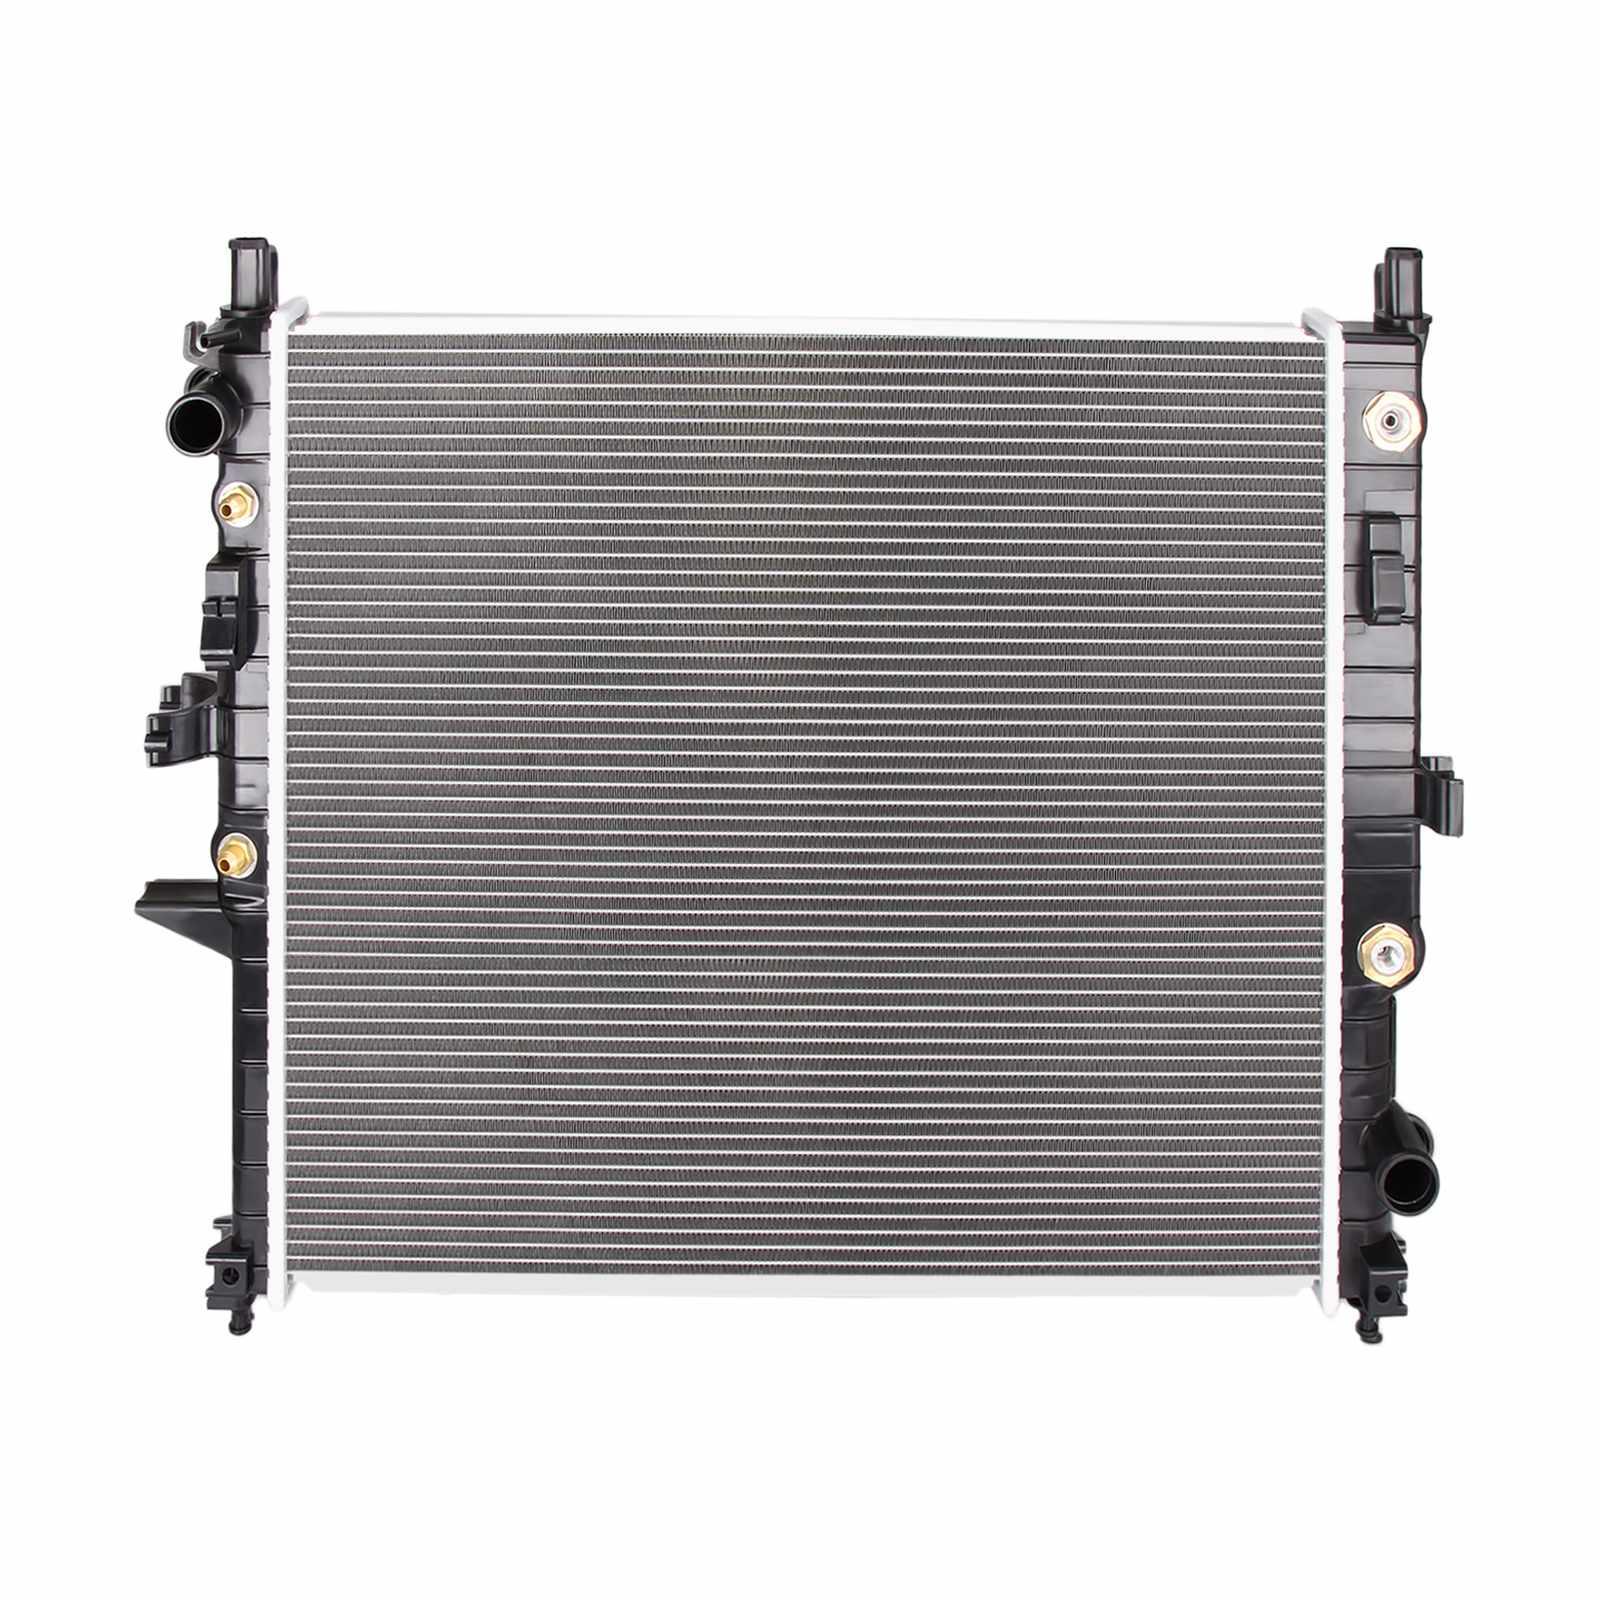 Dromedary New Radiator for Mercedes-Benz ML350 ML55 AMG V6 3.7 V8 5.5 2000-2005 AT MT 2345 MERCEDES BENZ RADIATOR image5